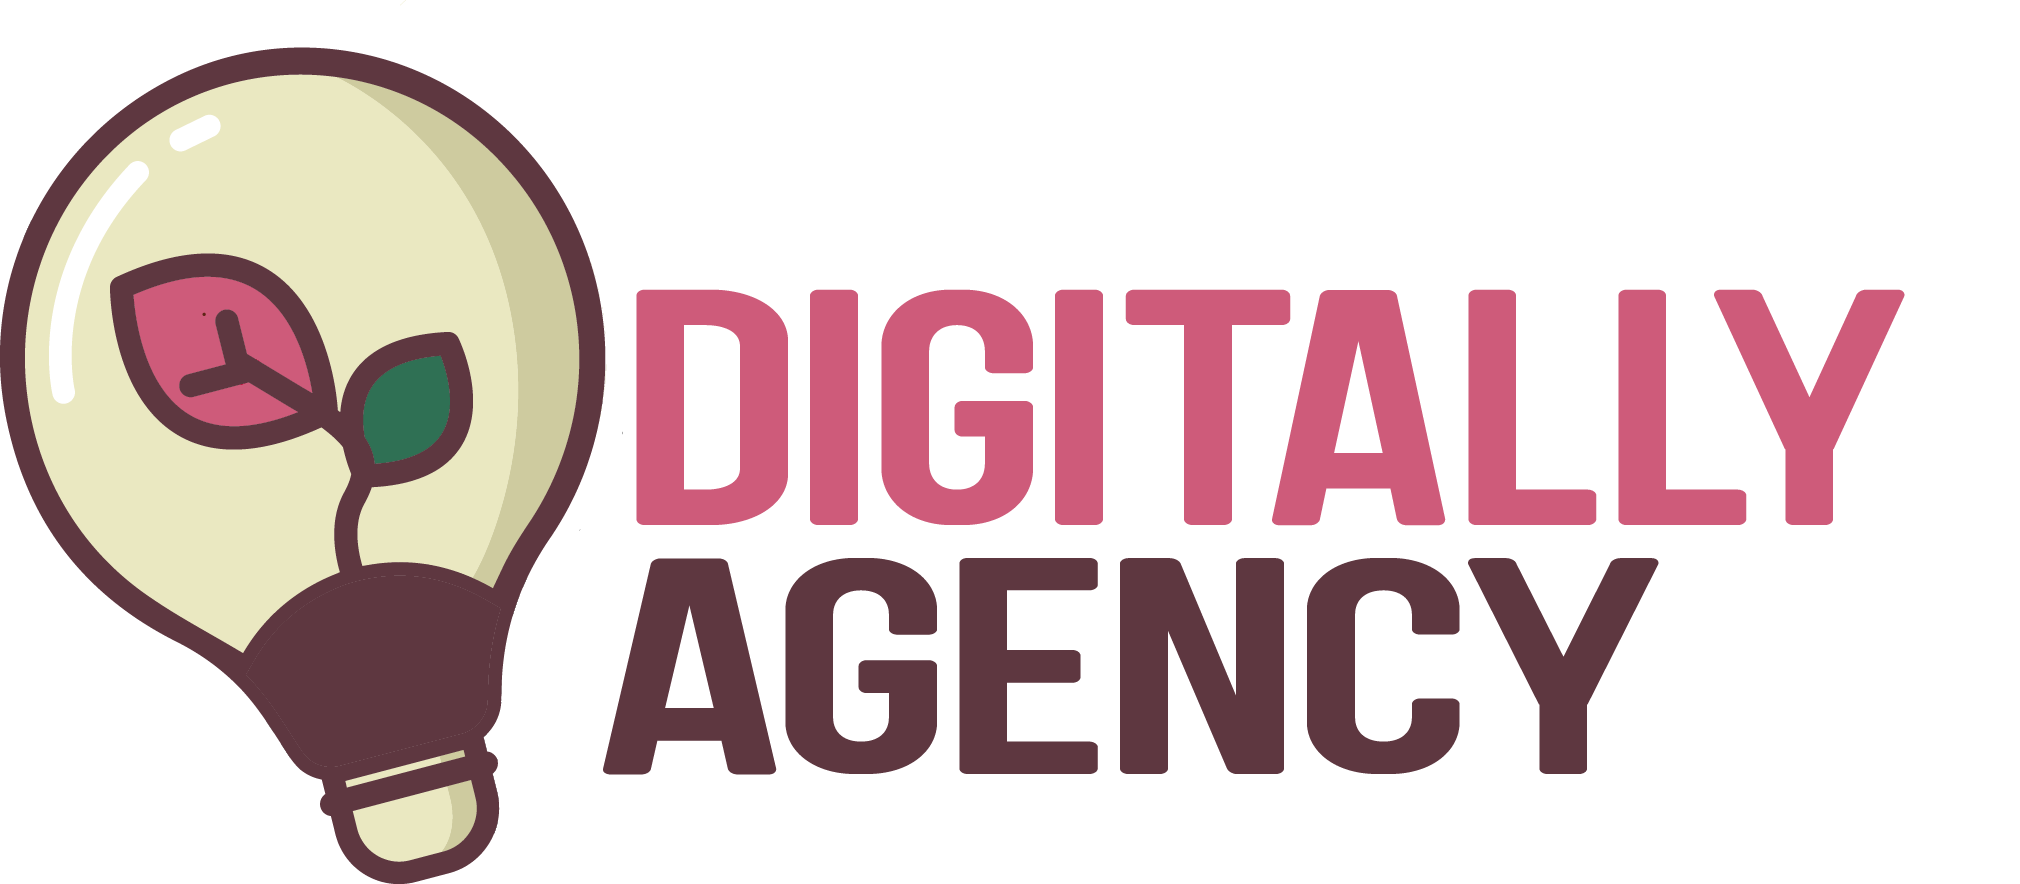 Digitally Agency